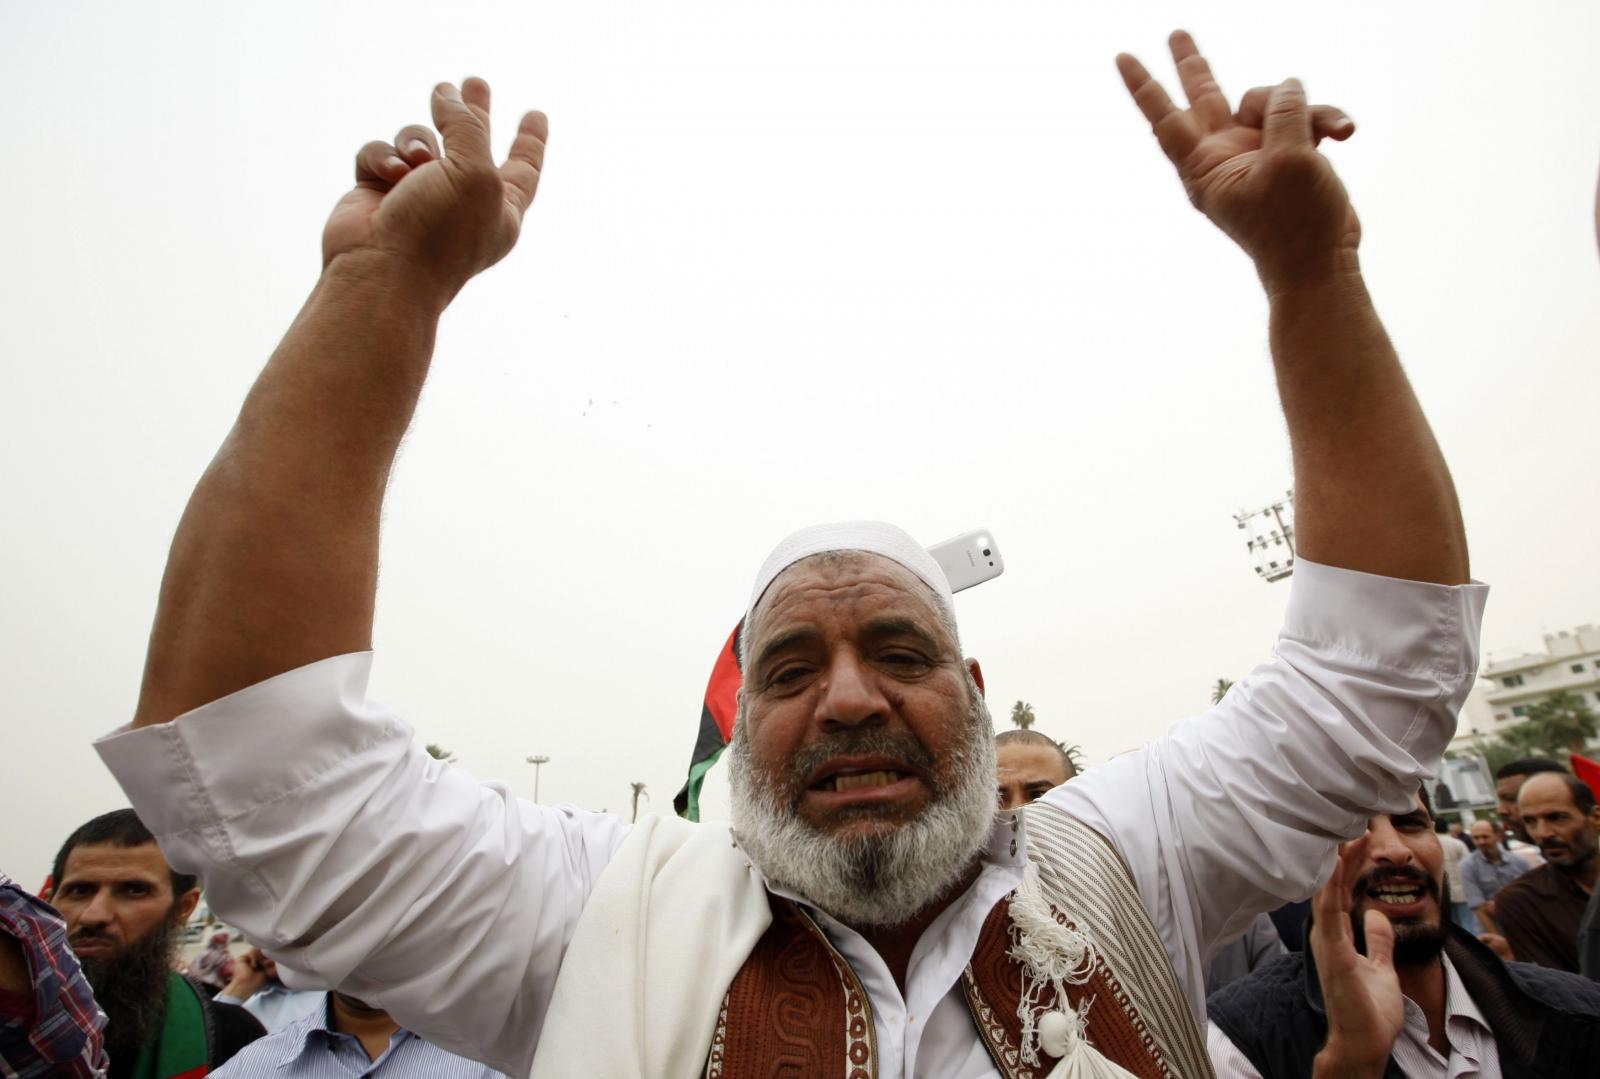 LIBYA COURT